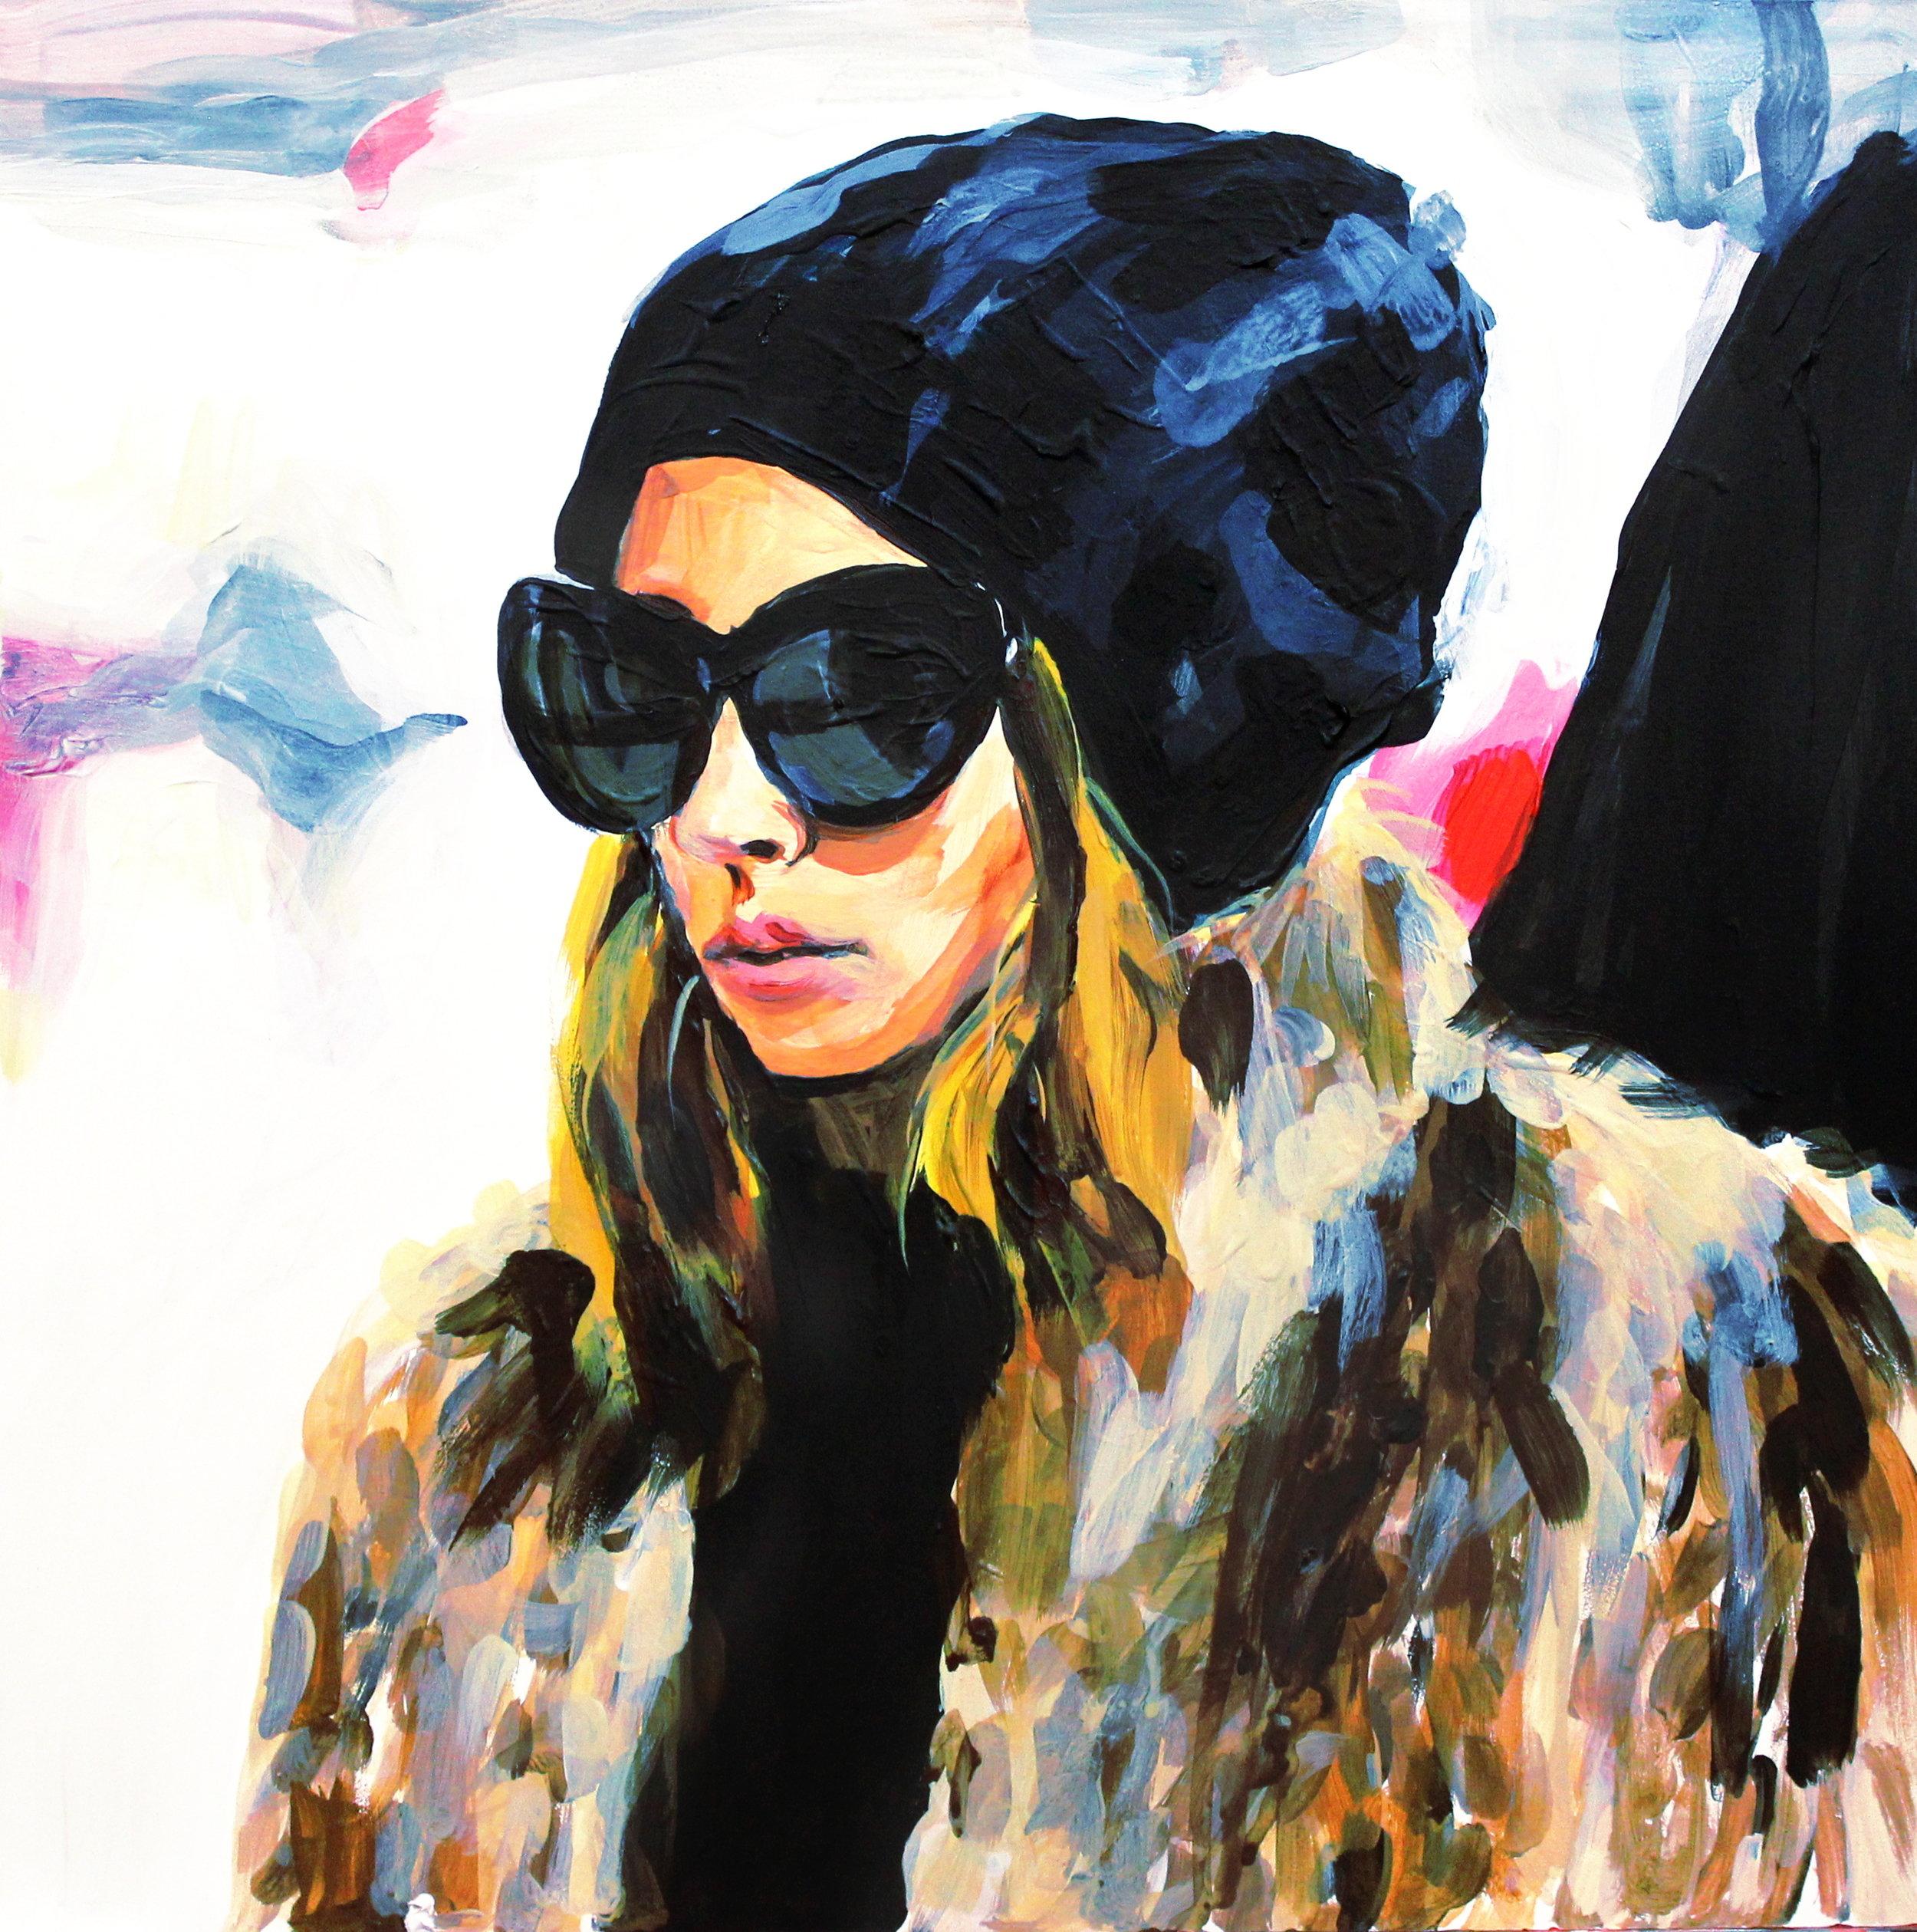 "Nicole Richie in a Fur Coat   12"" x 12"" acrylic on panel"